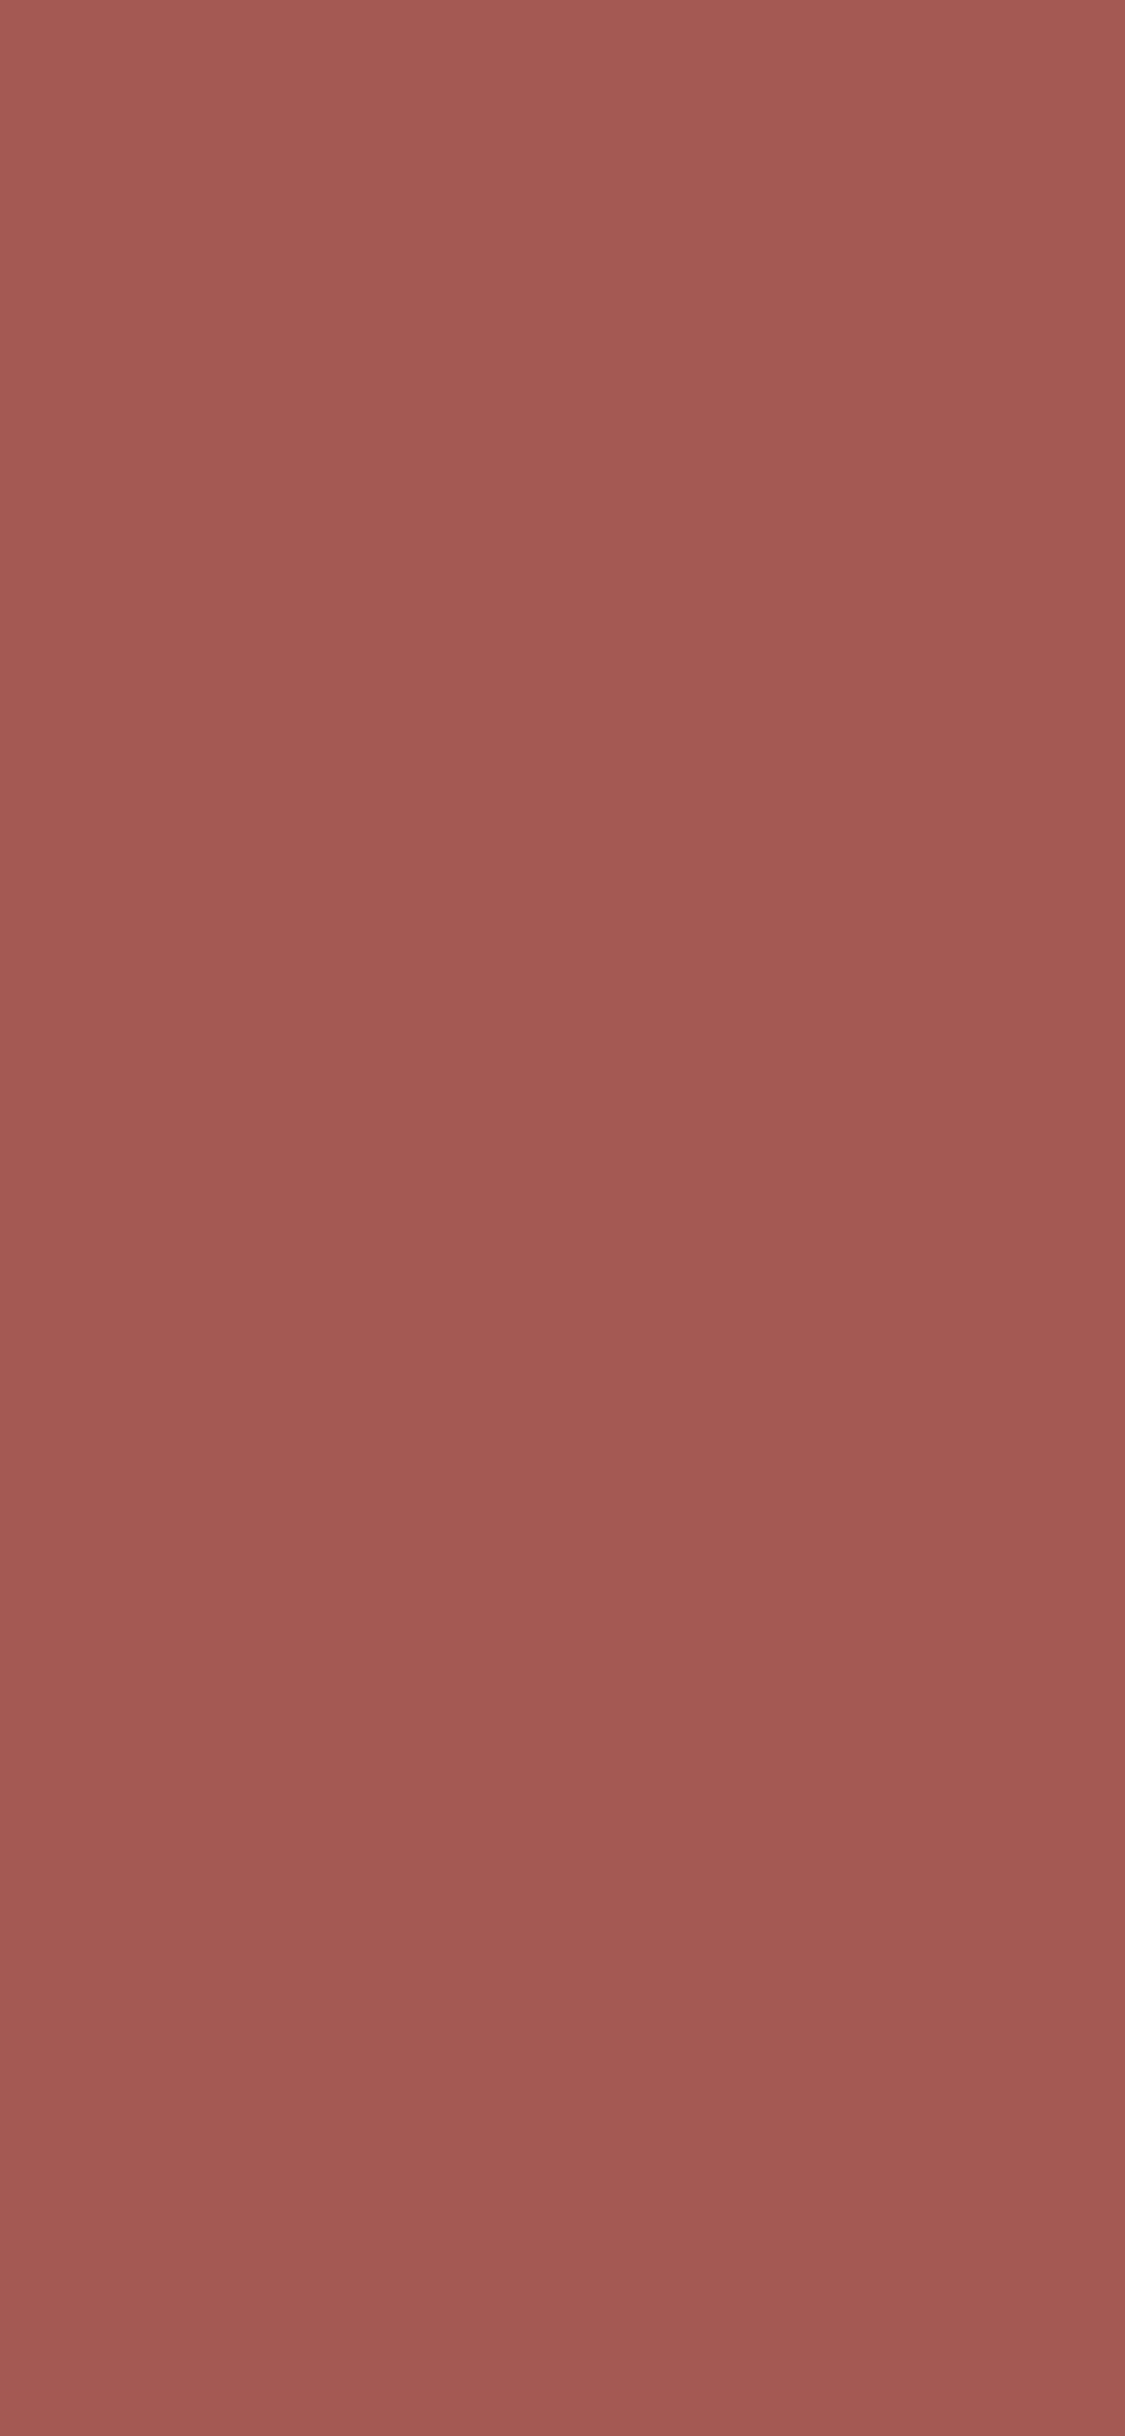 1125x2436 Redwood Solid Color Background